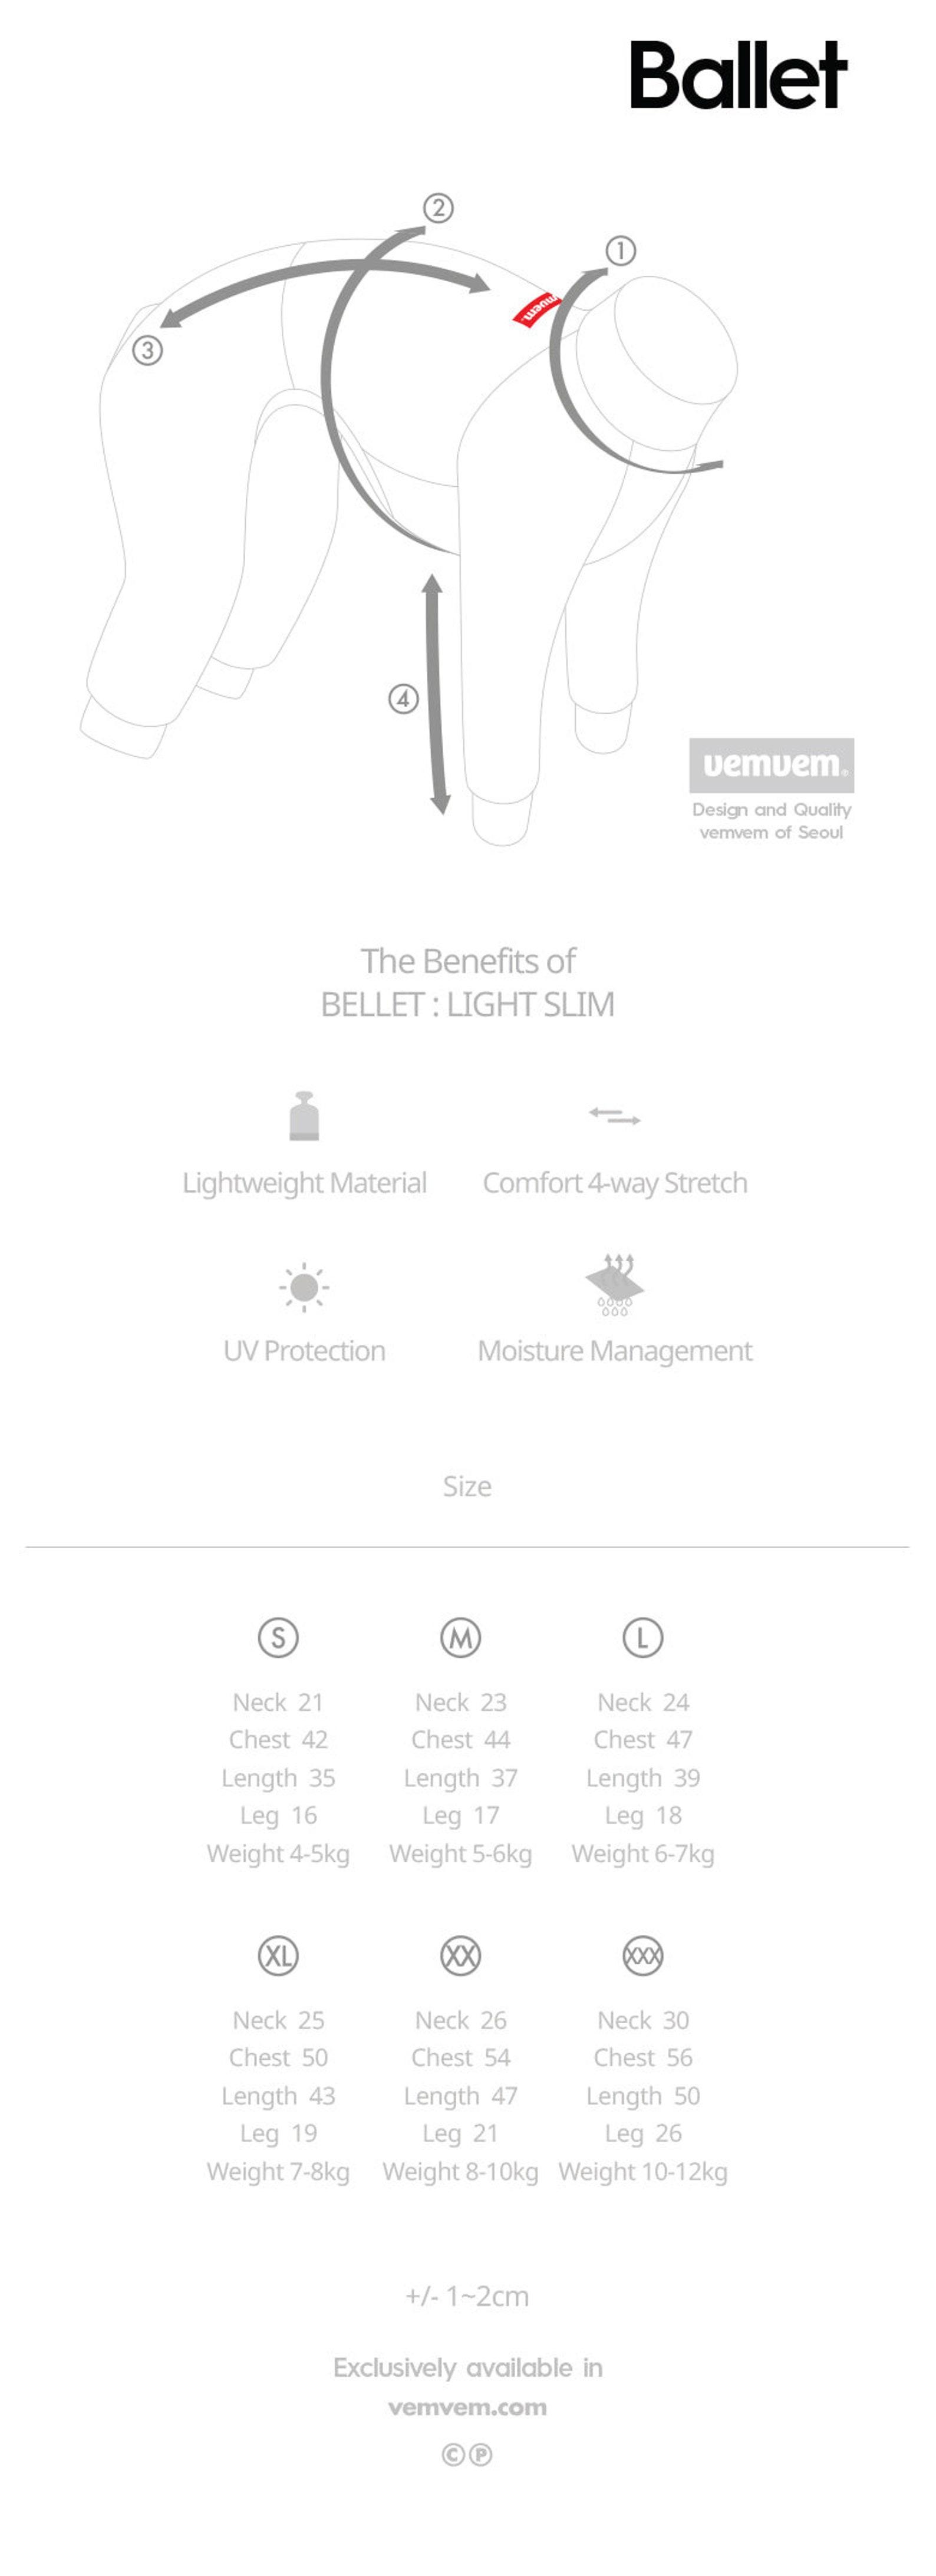 vemvem® ballet: light slim - olive green for italian greyhound